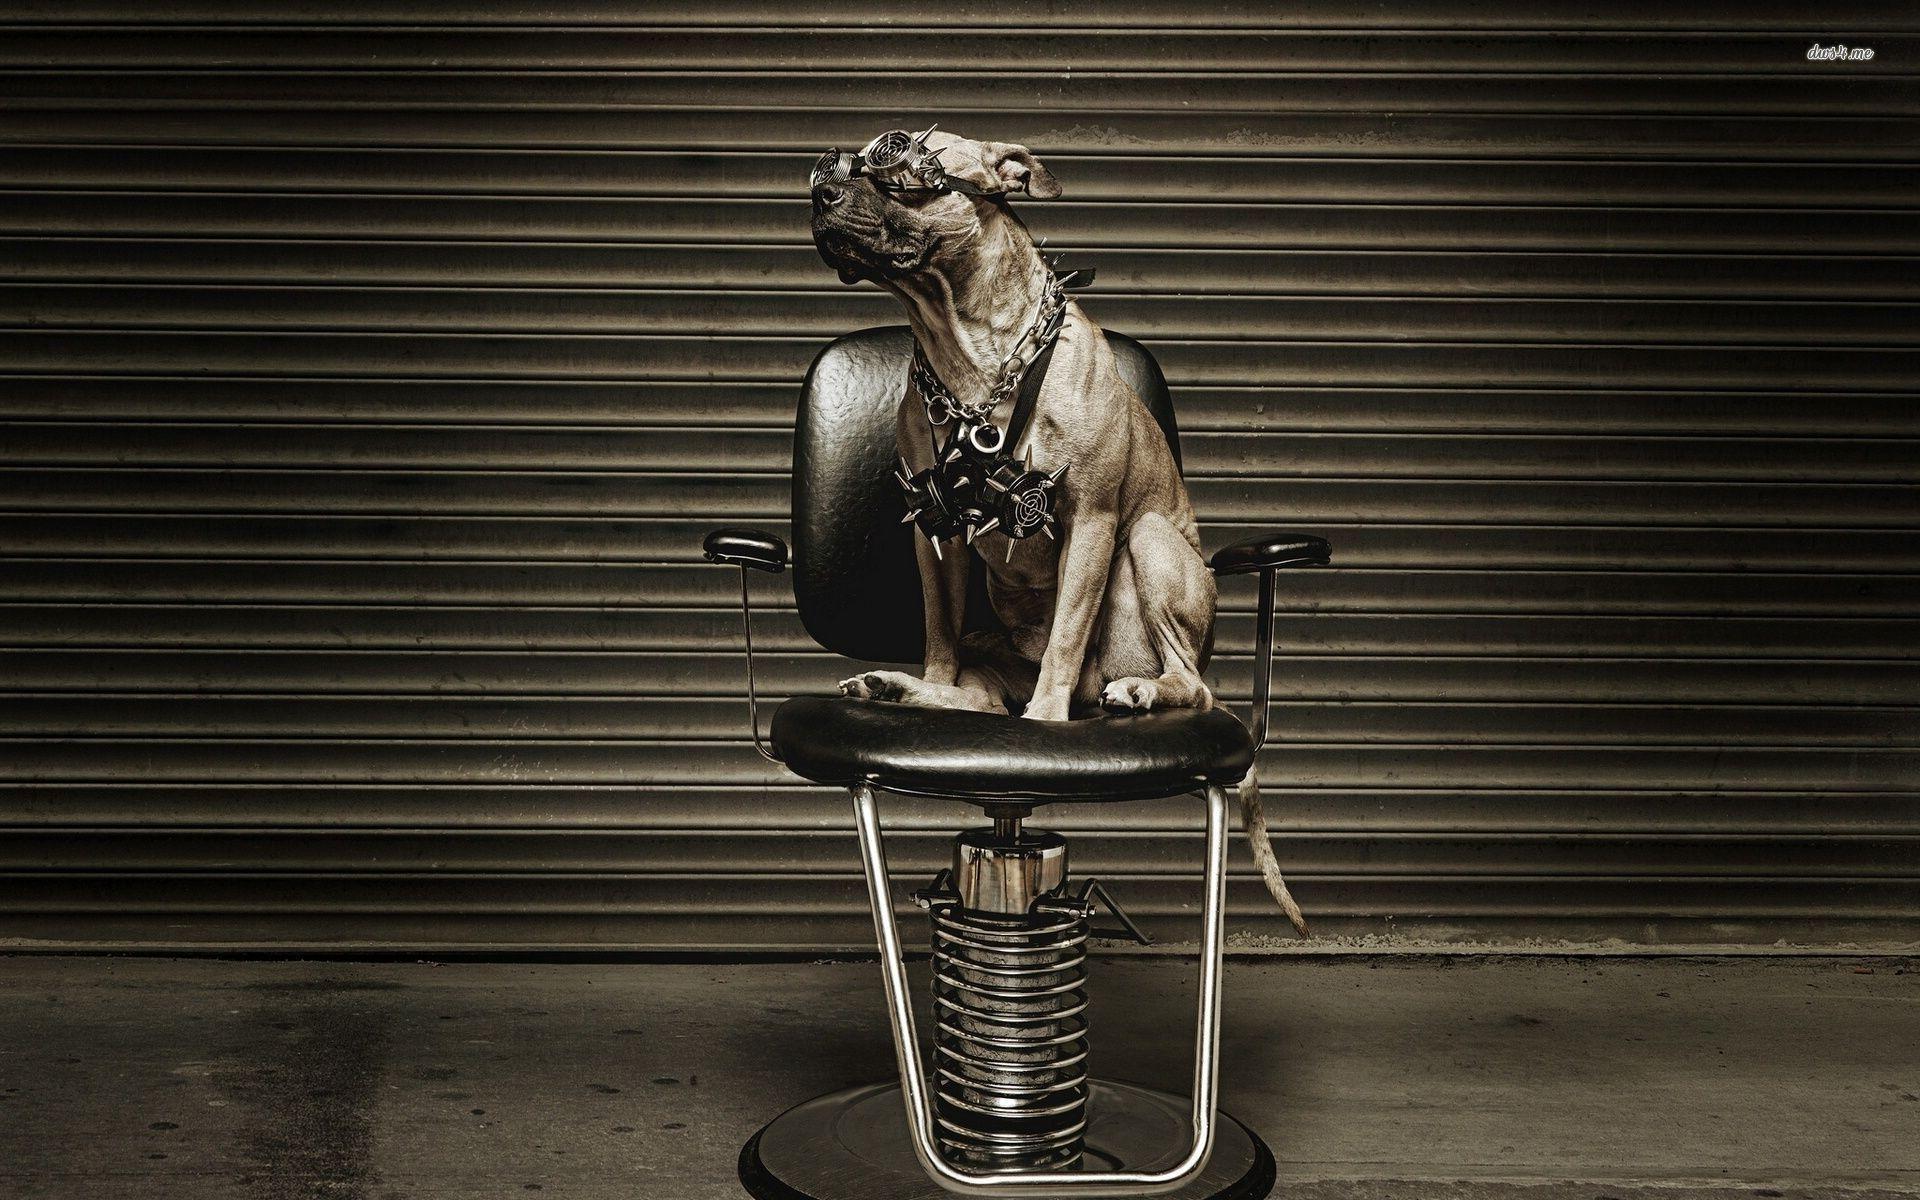 HD-pics-pitbull-dogs - wallpaper.wiki